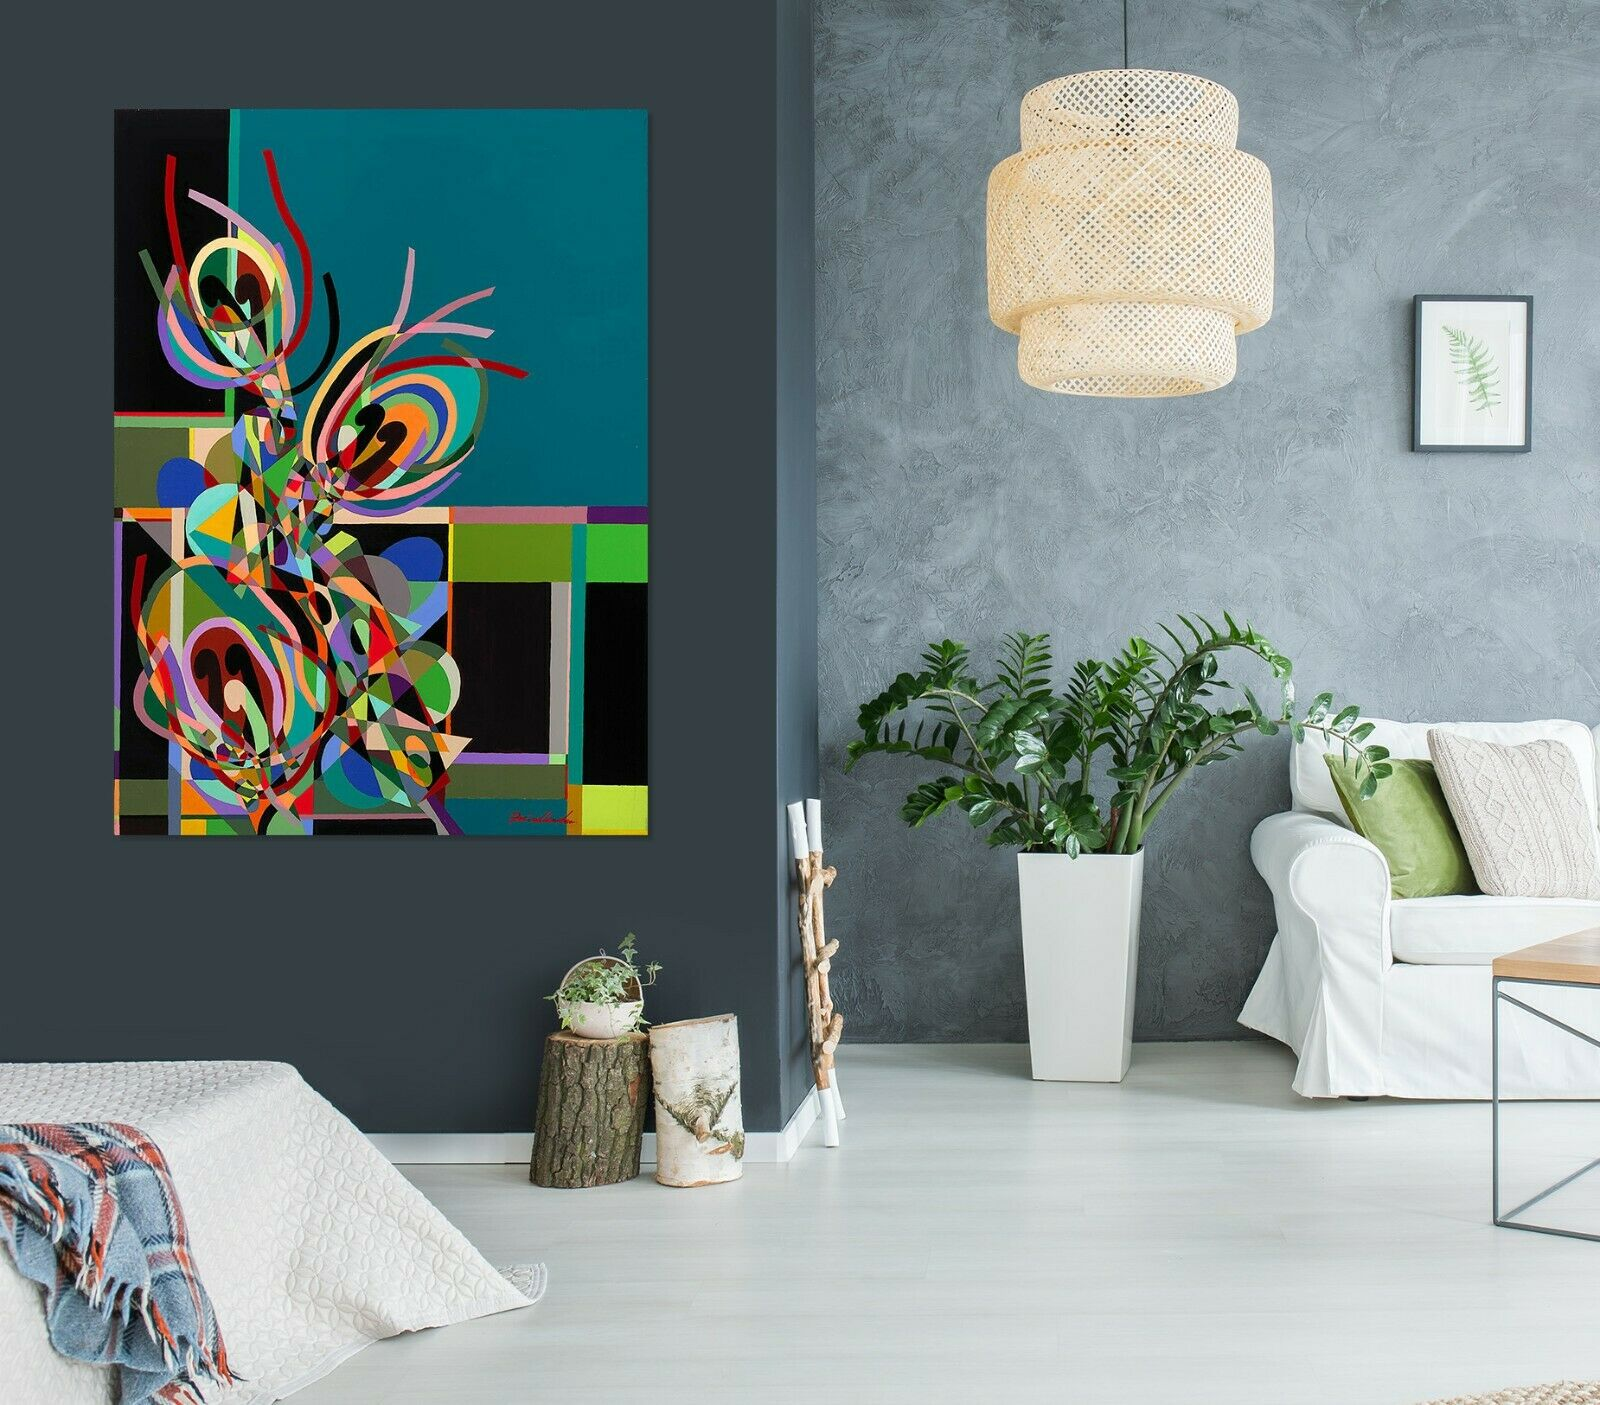 3D Farbe Line Pattern 015NAN Wall Stickers Vinyl Wallpaper Murals Allan P Ava